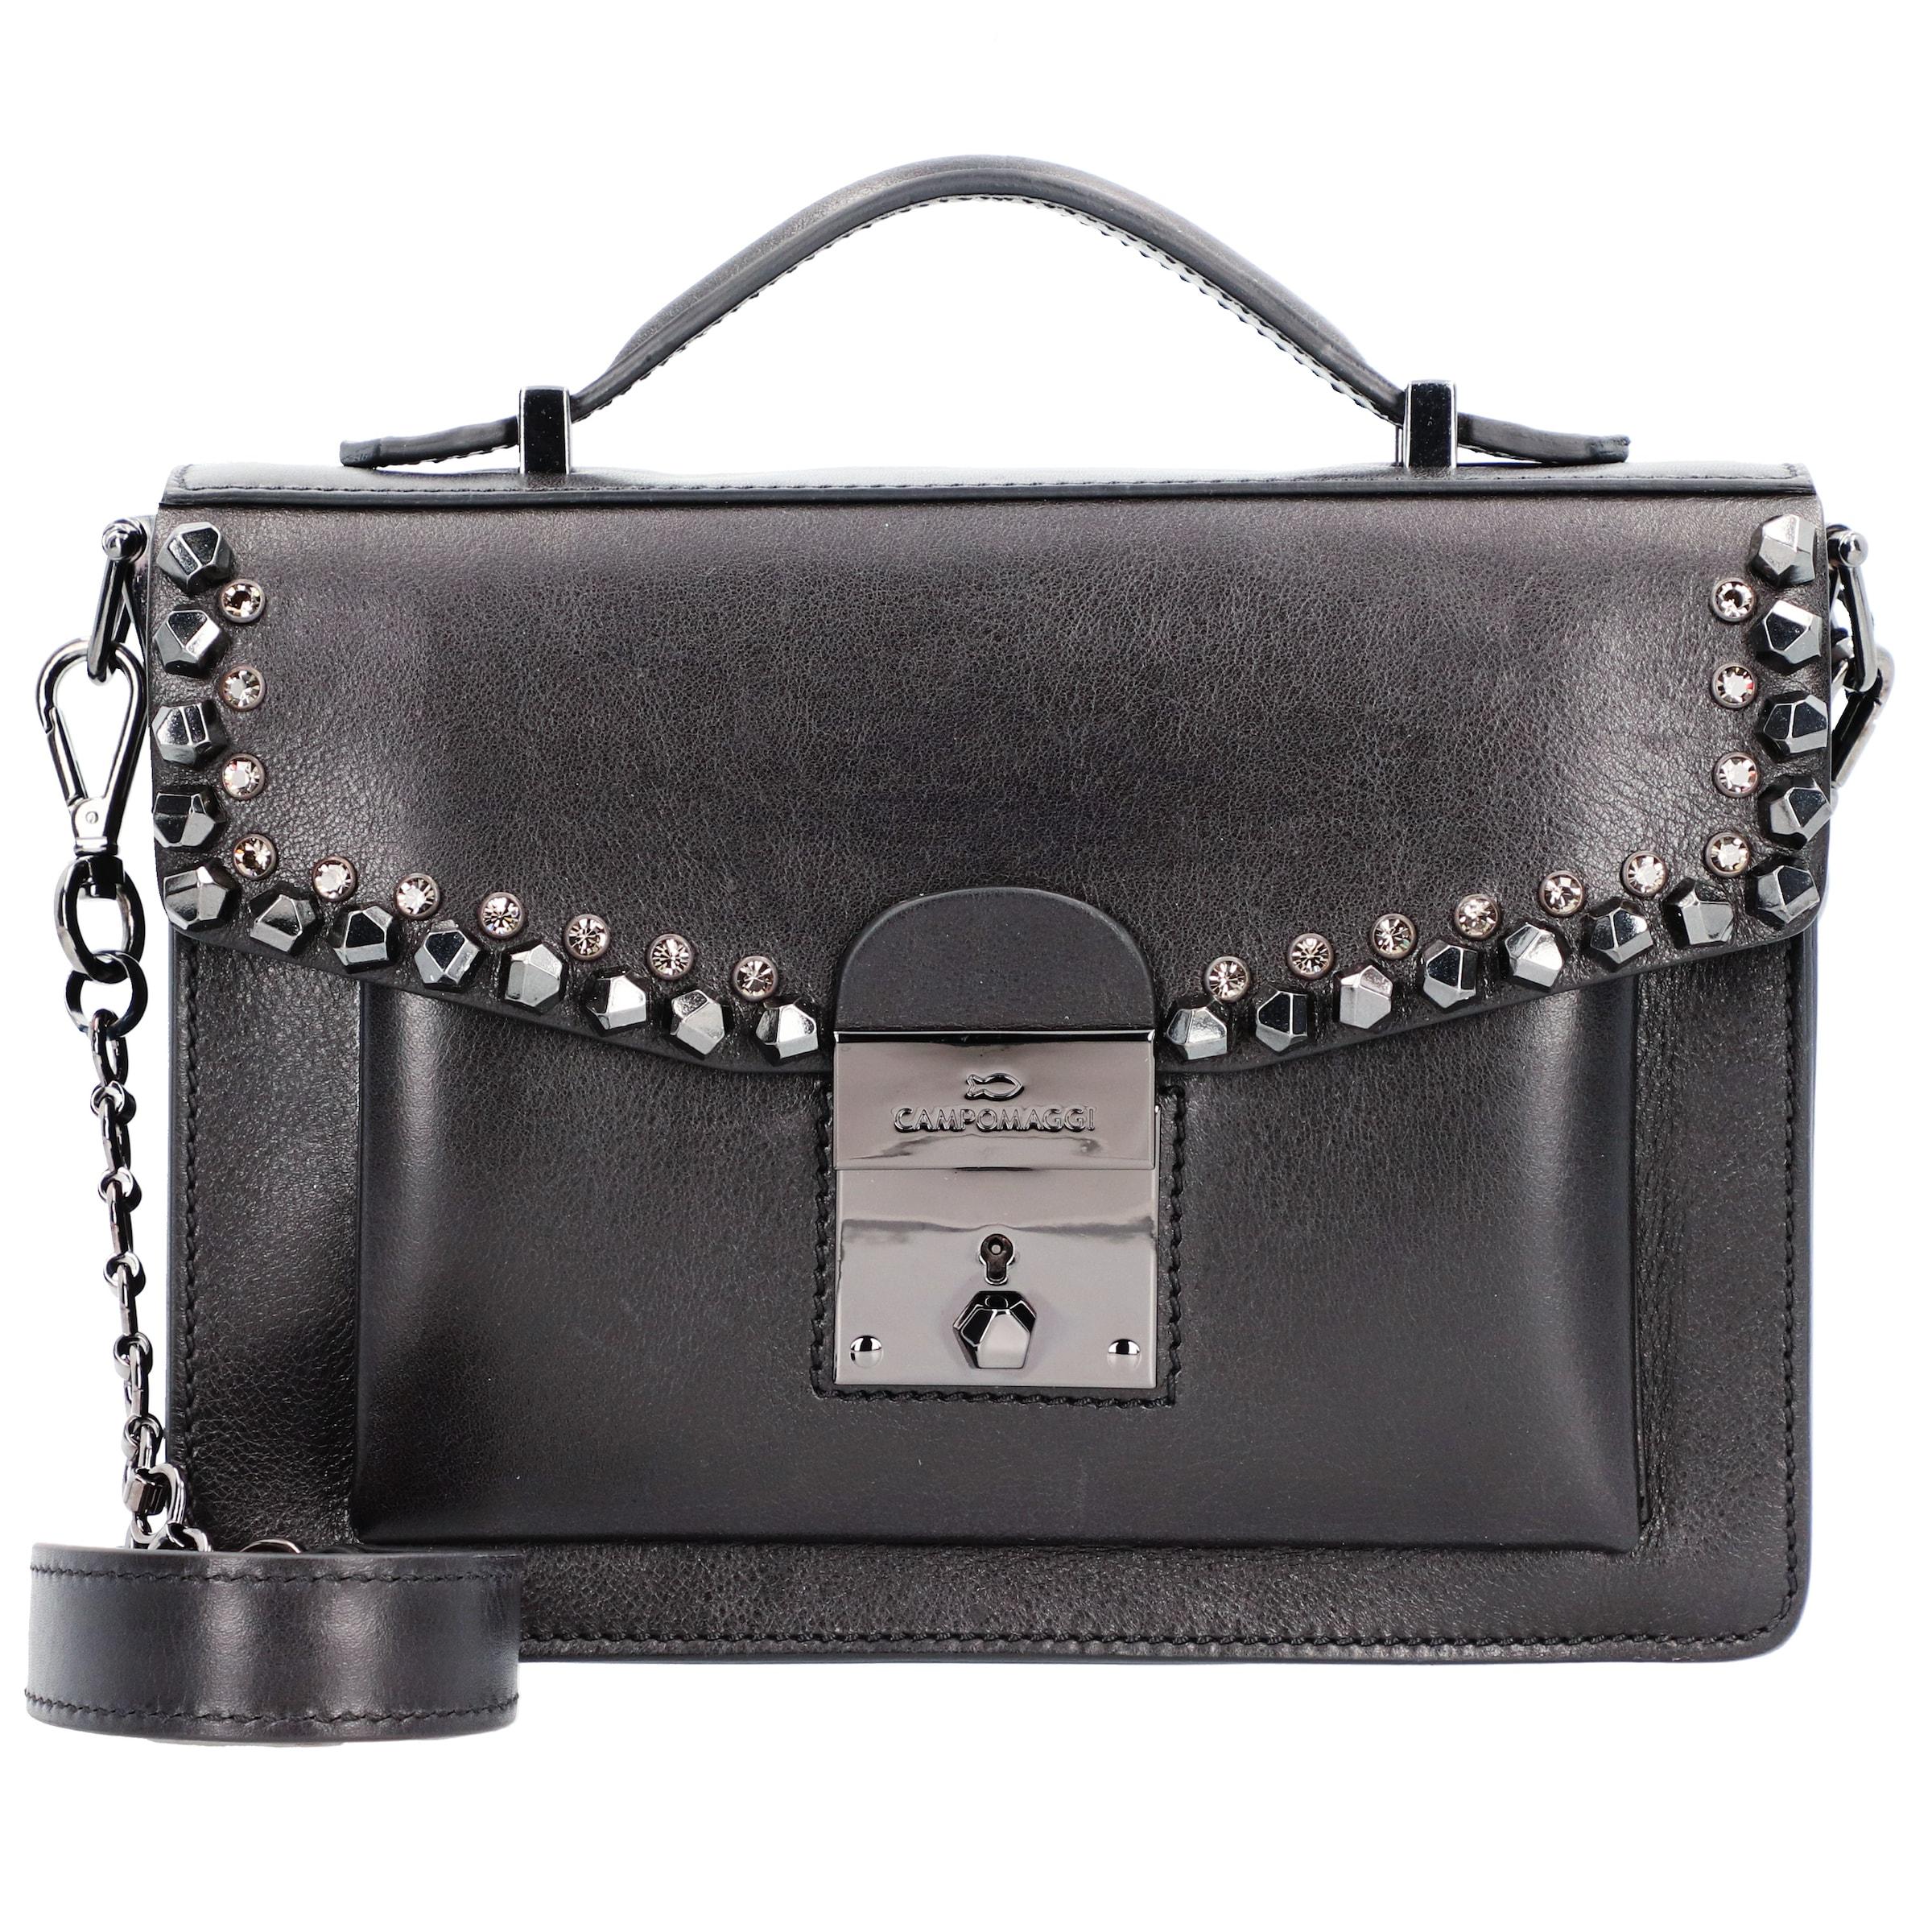 Schwarz Handtasche Handtasche Campomaggi In Campomaggi xedCBorW